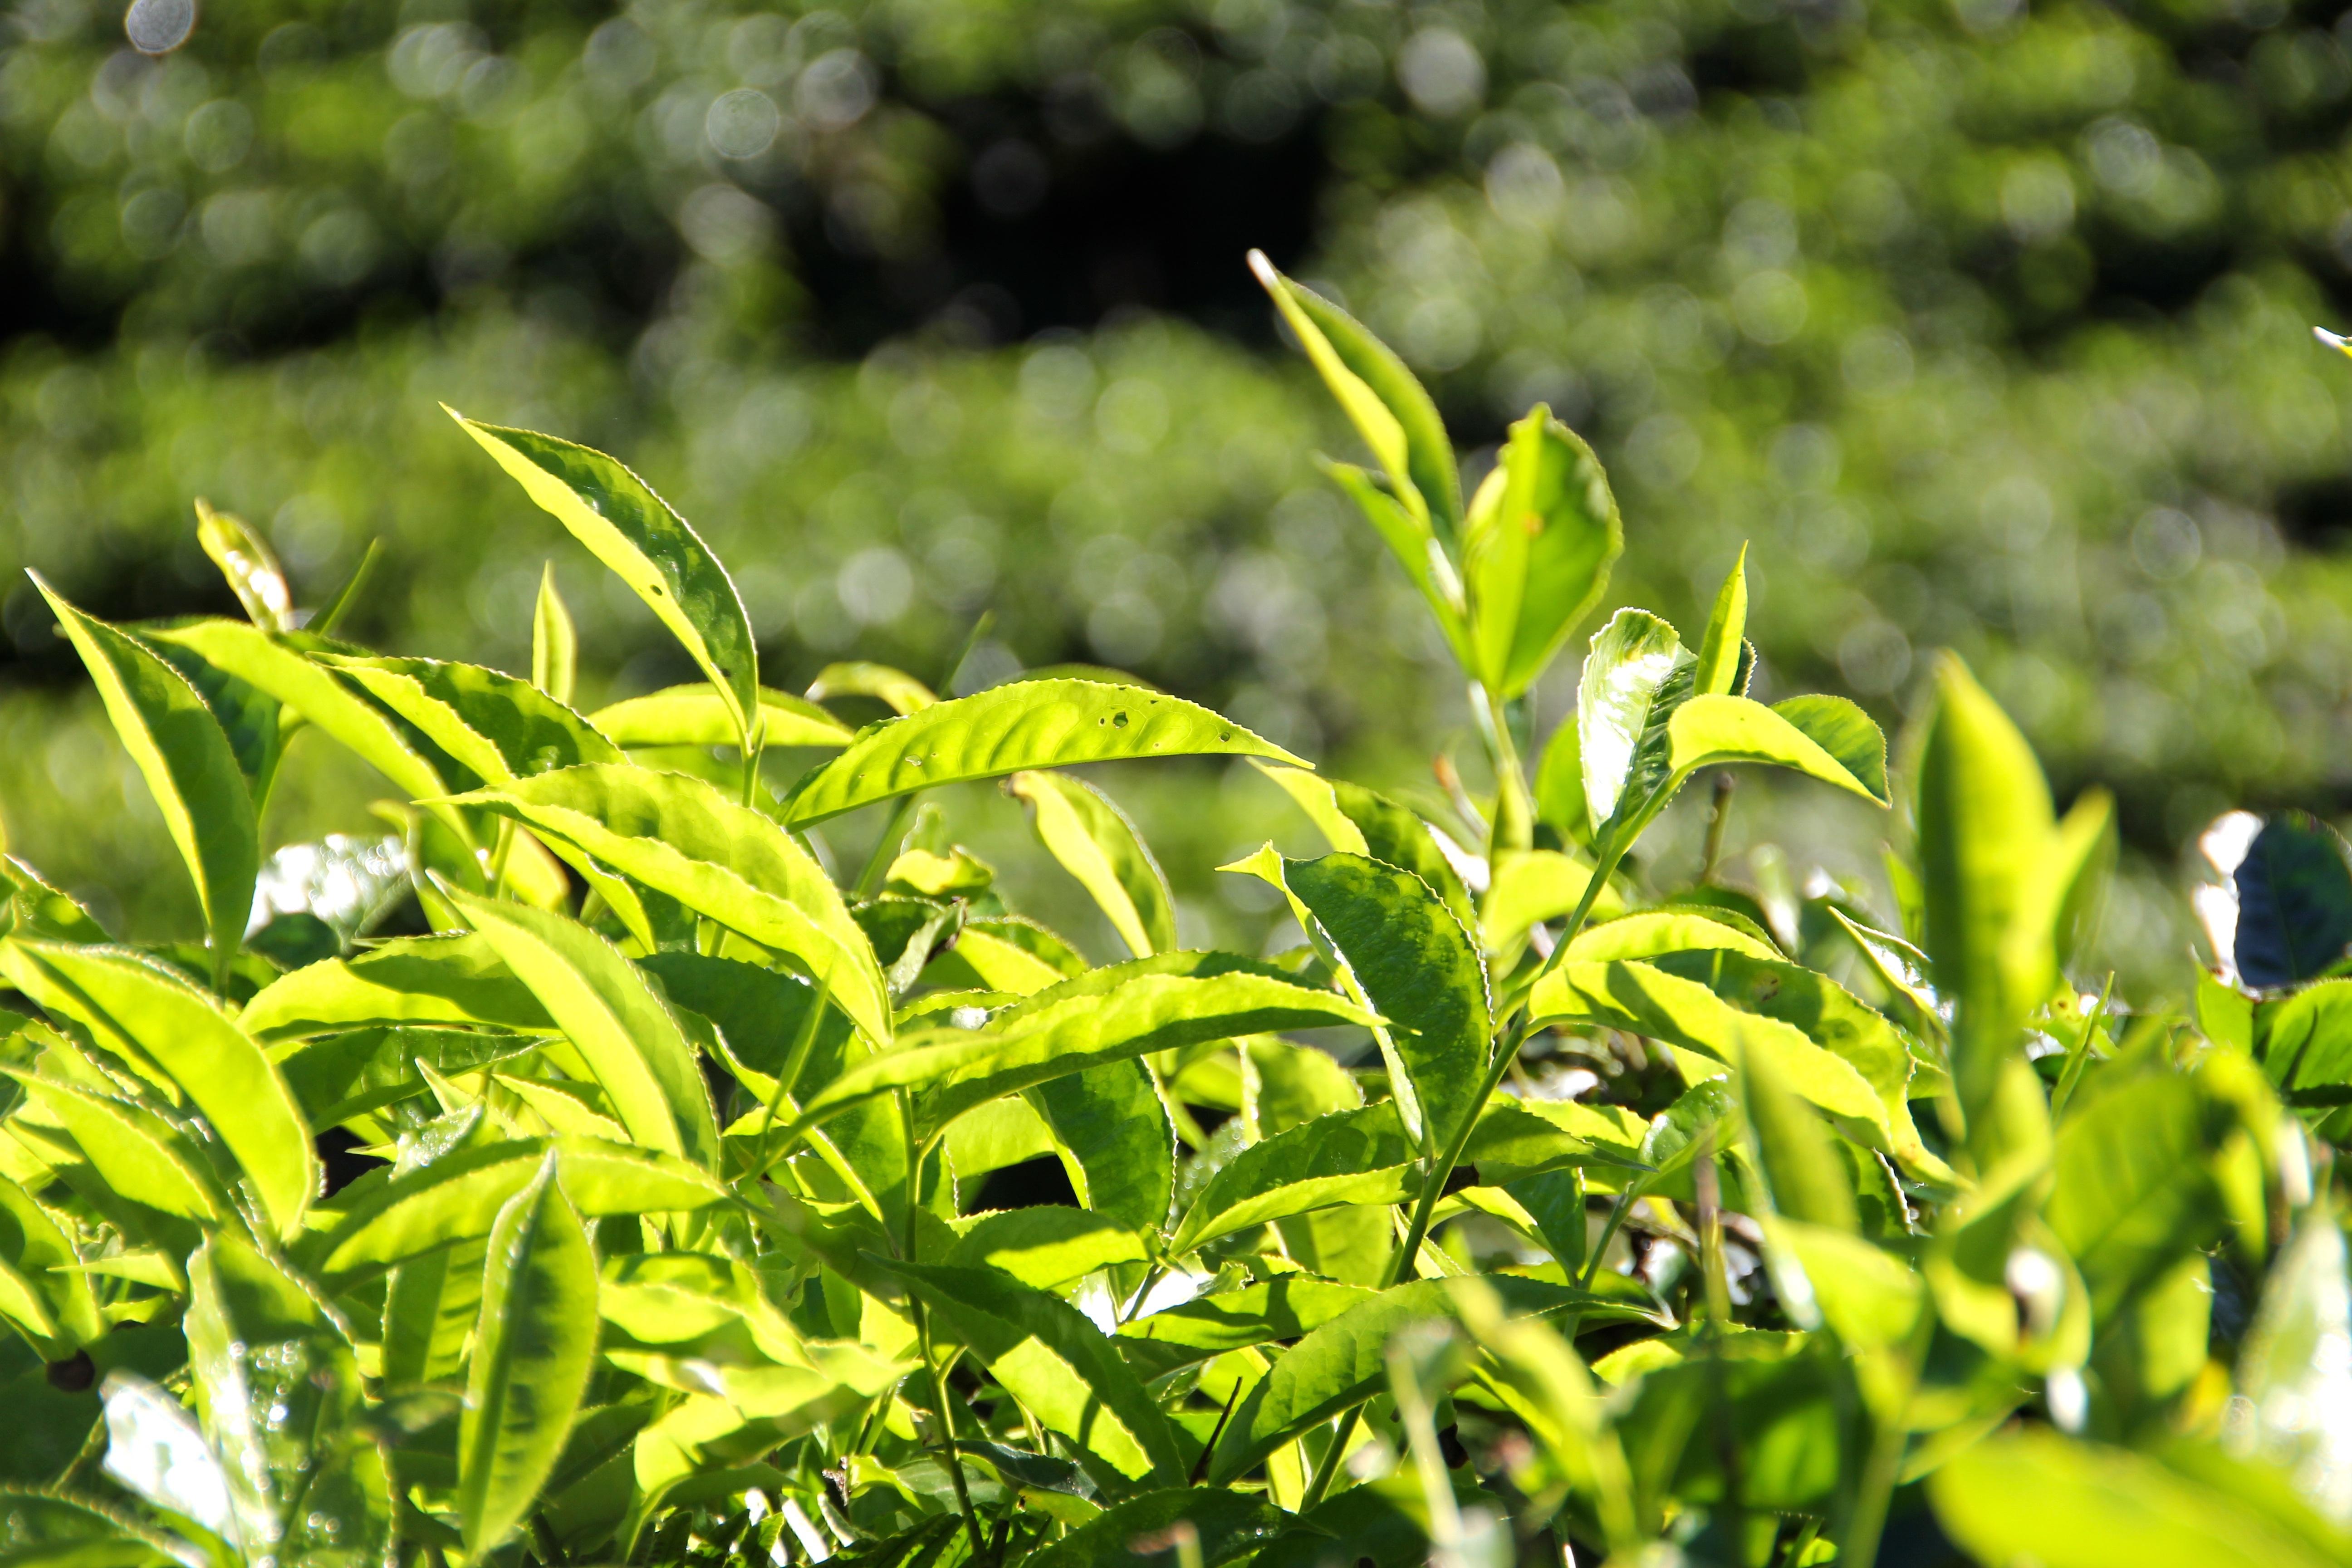 Gambar : cabang, menanam, halaman rumput, daun, bunga ...